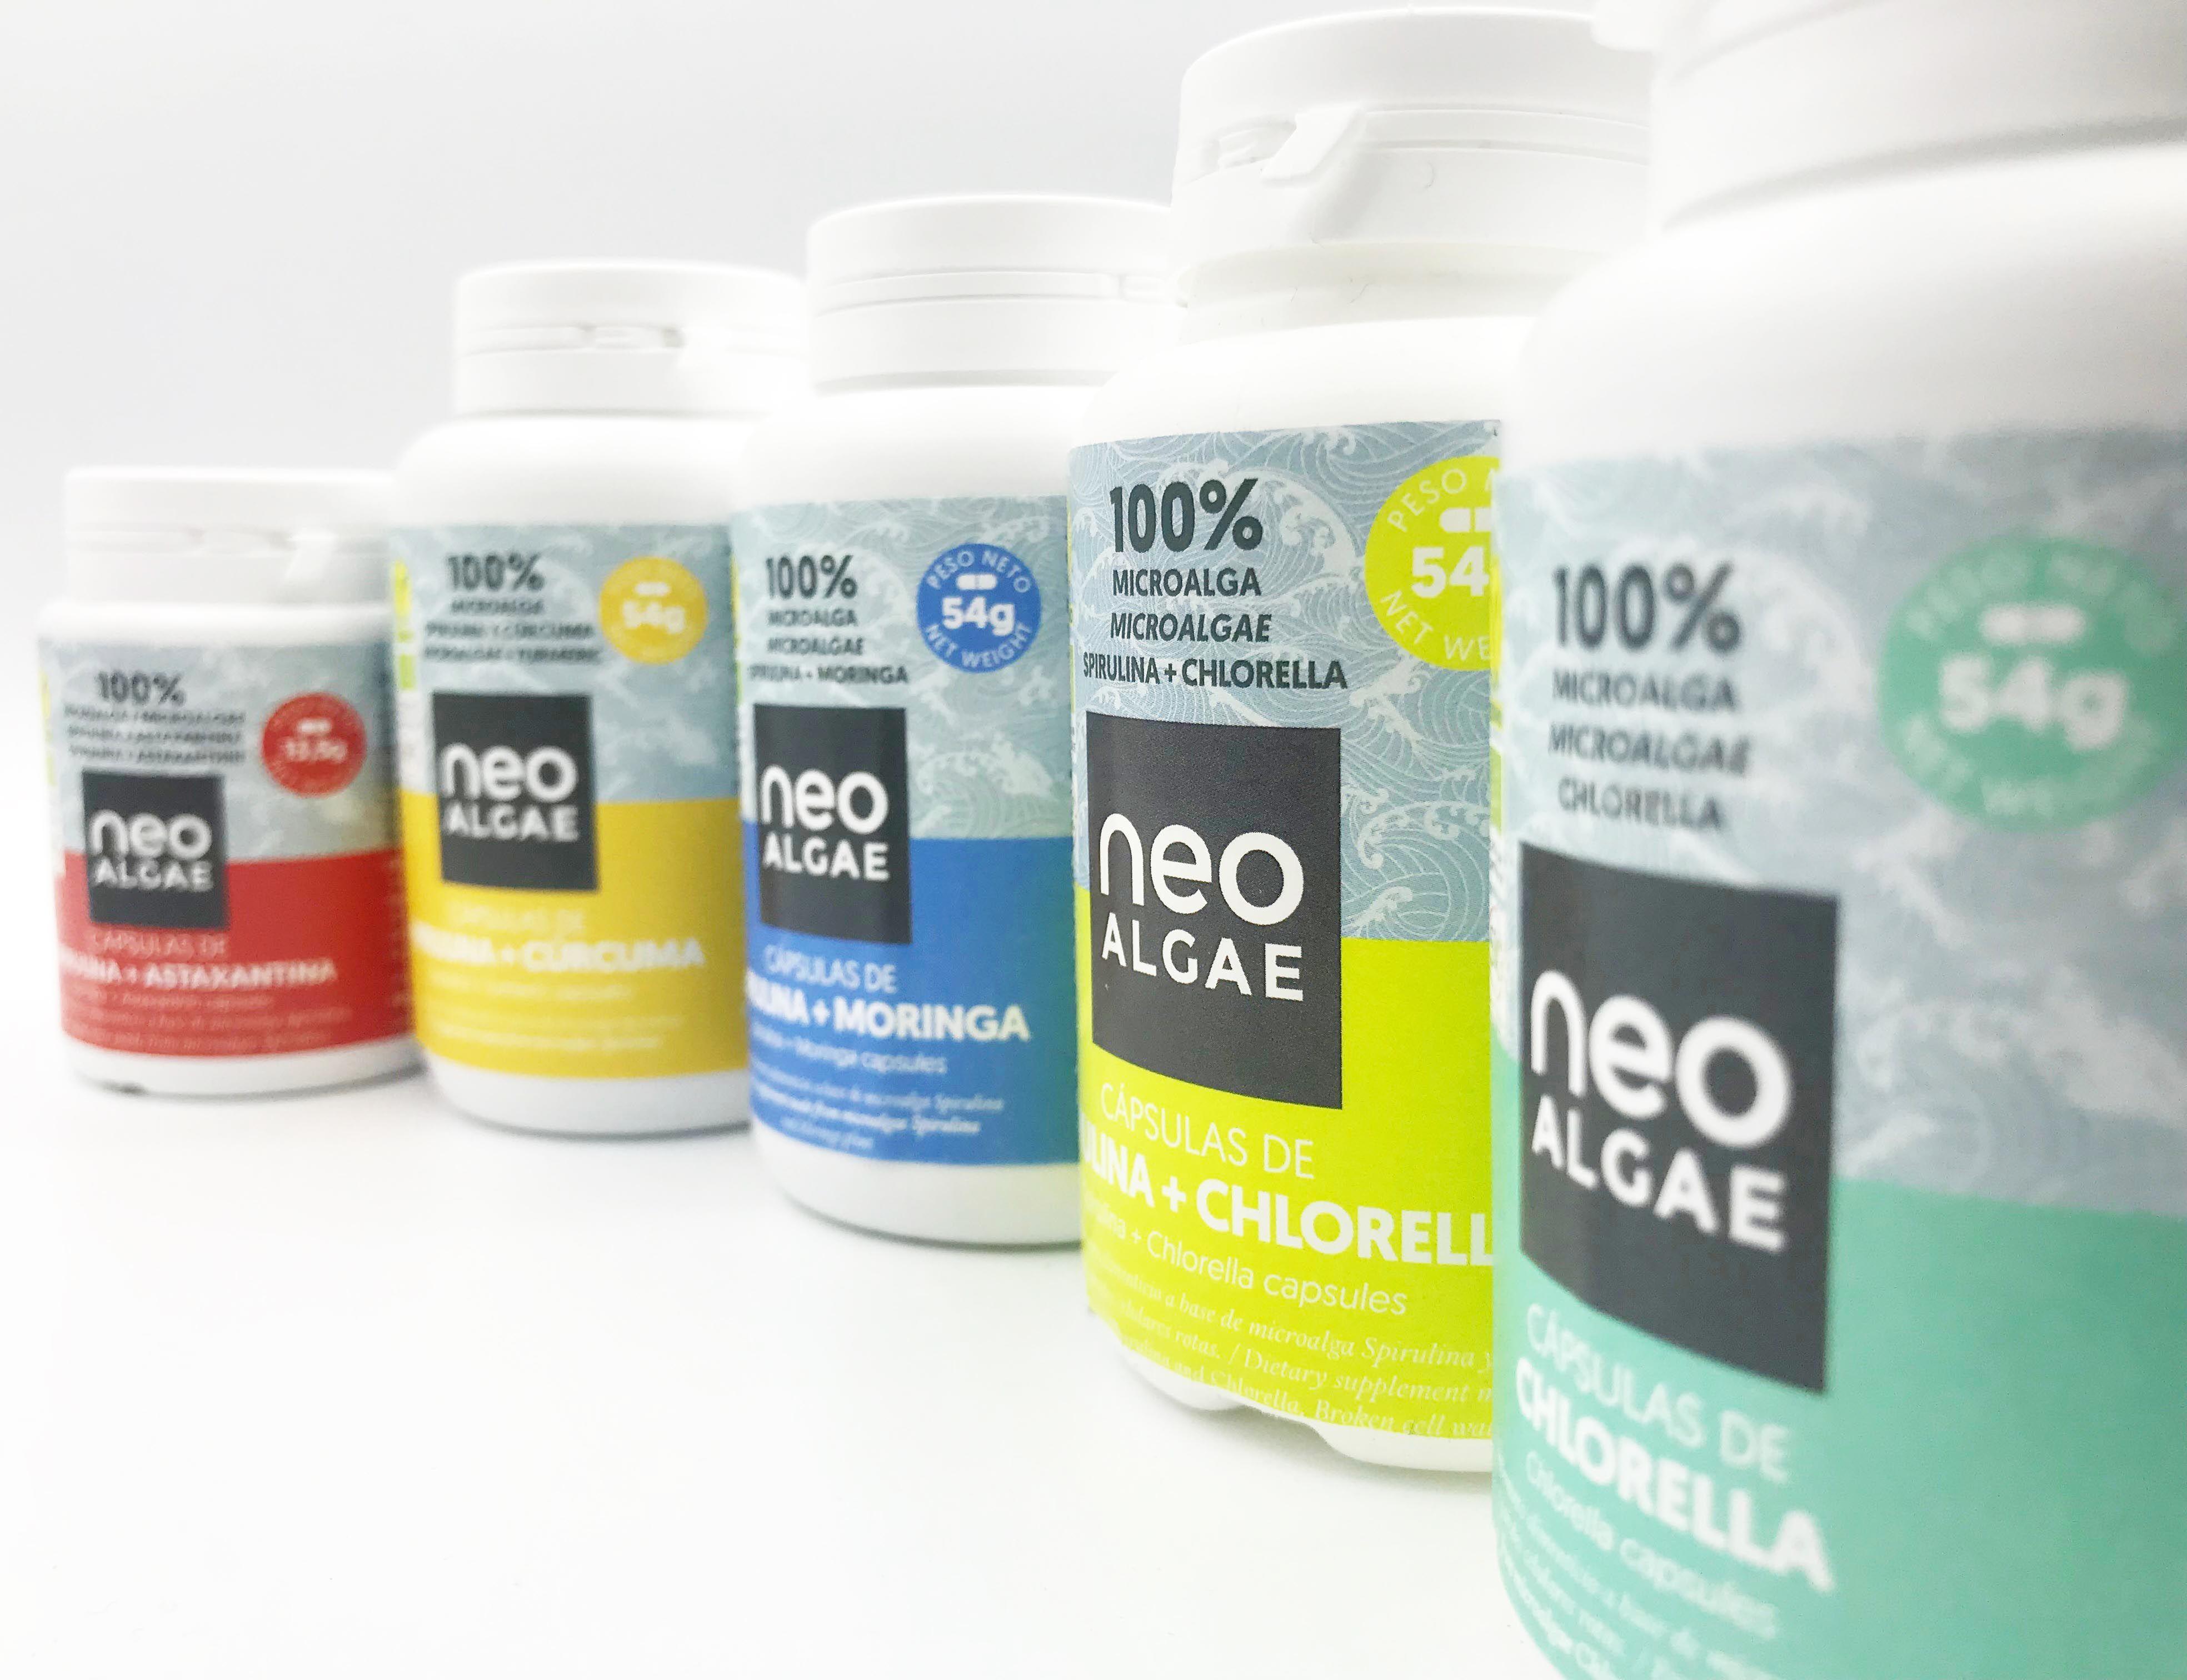 Neoalgae patenta un nuevo encapsulado para la Astaxantina